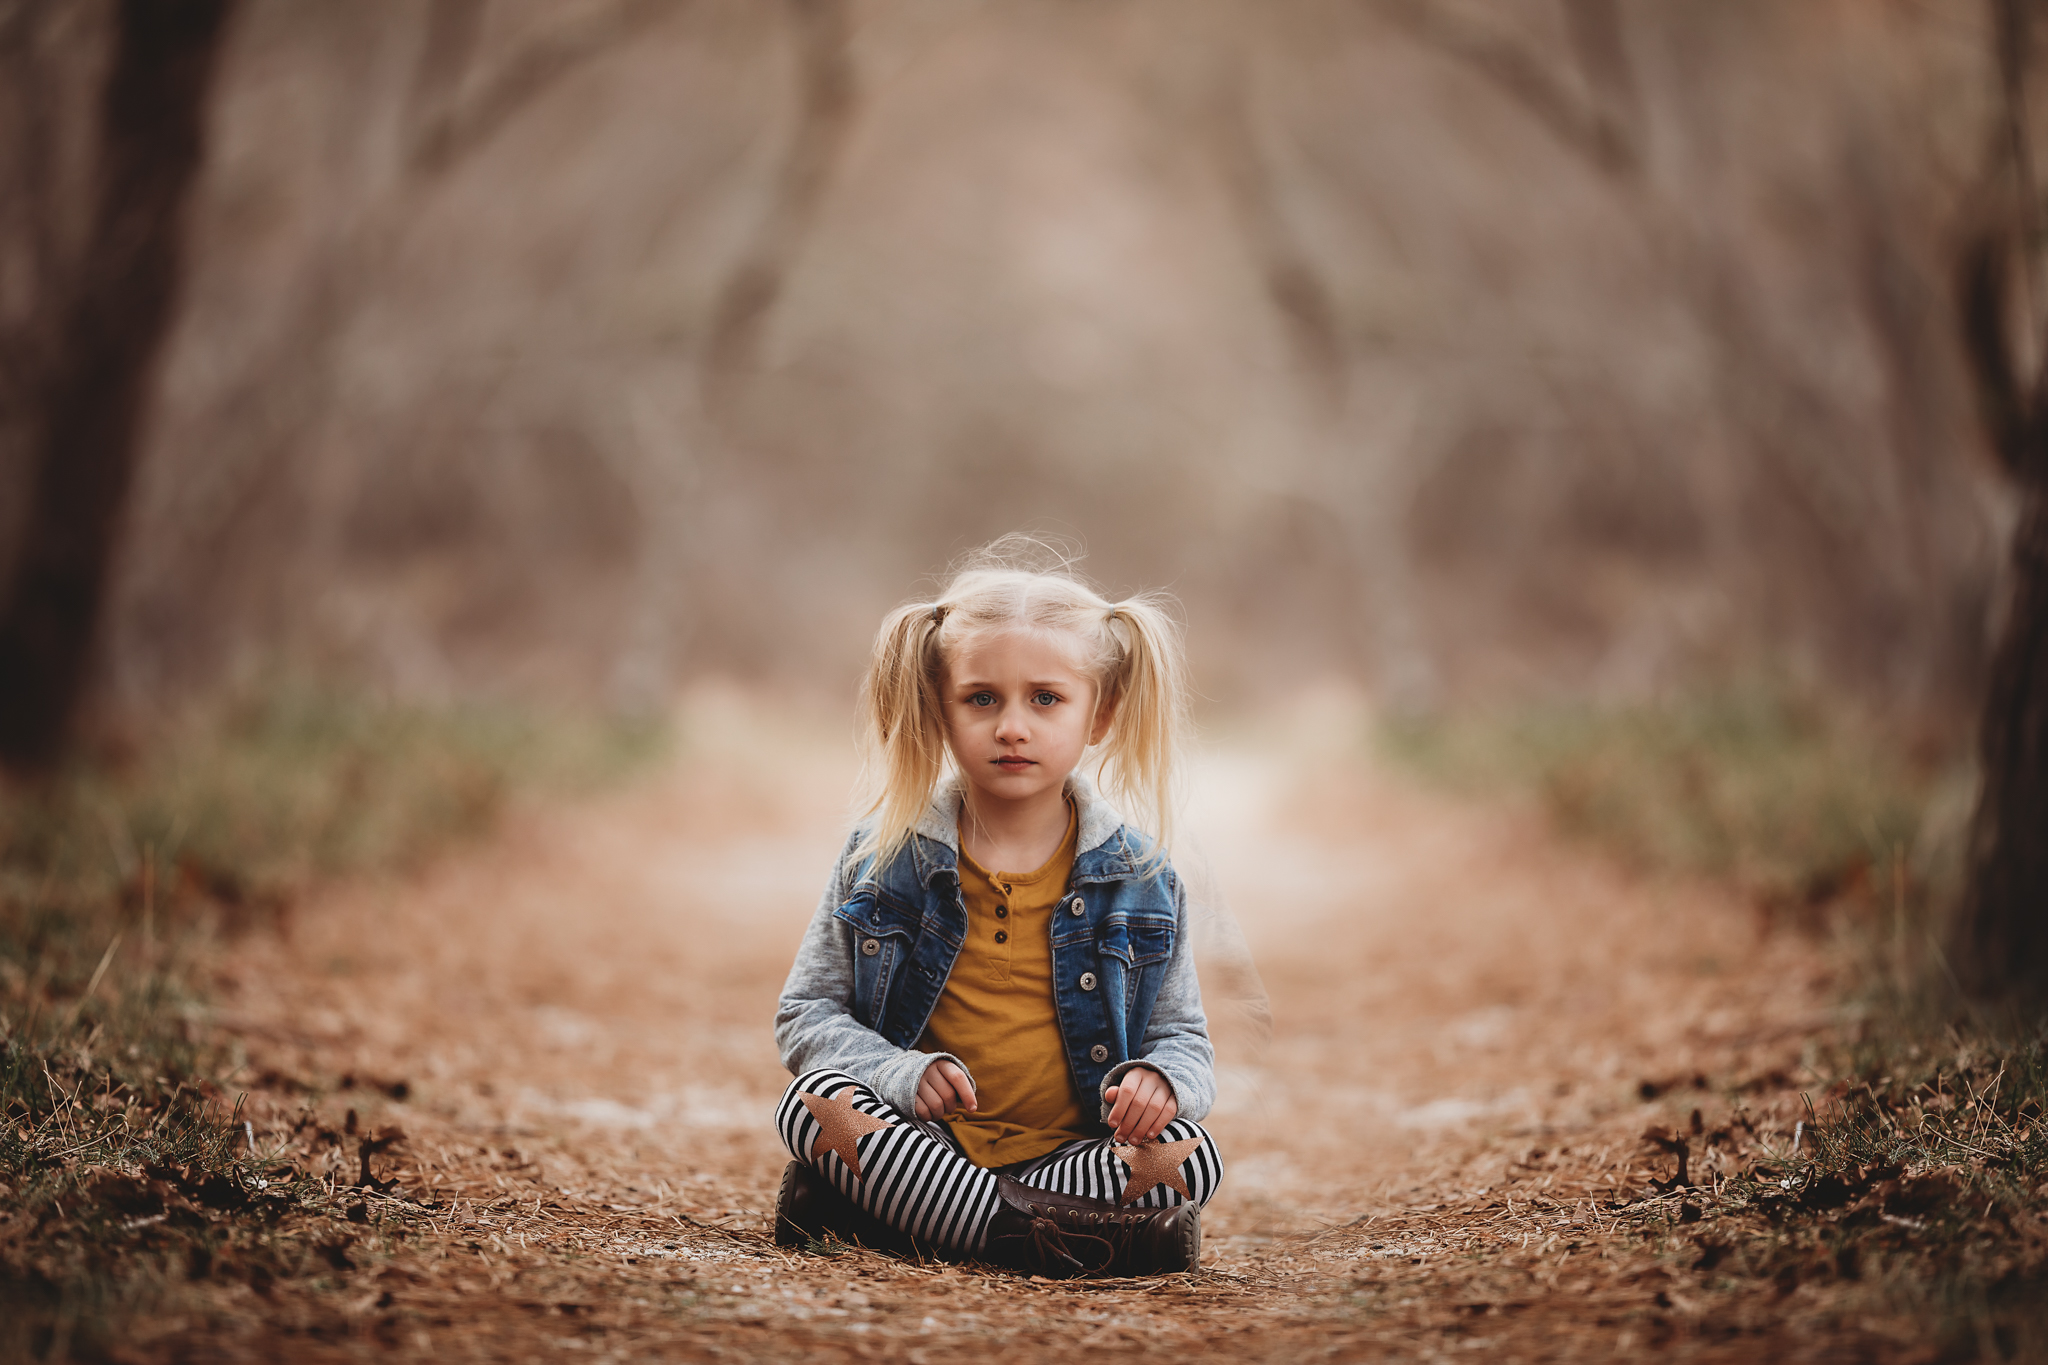 Long-island-photographer-hello-olivia-photography-children-kids-photos-new-york-lifestyle-portraits-suffolk-County-LI-55.jpg